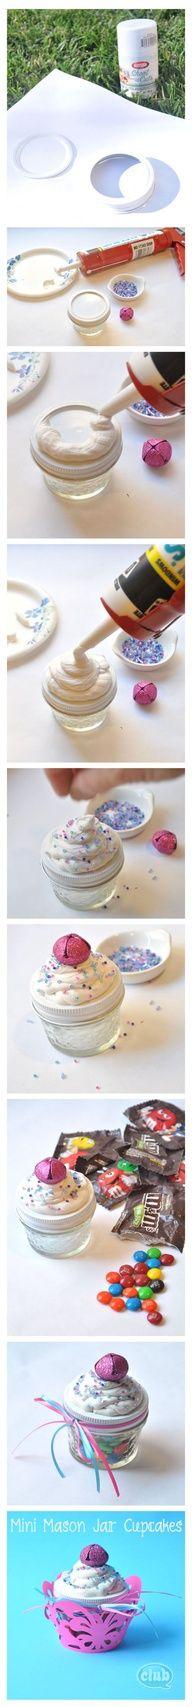 Mini Mason jar cupcakes!  So adorable!  #diy #tutorial